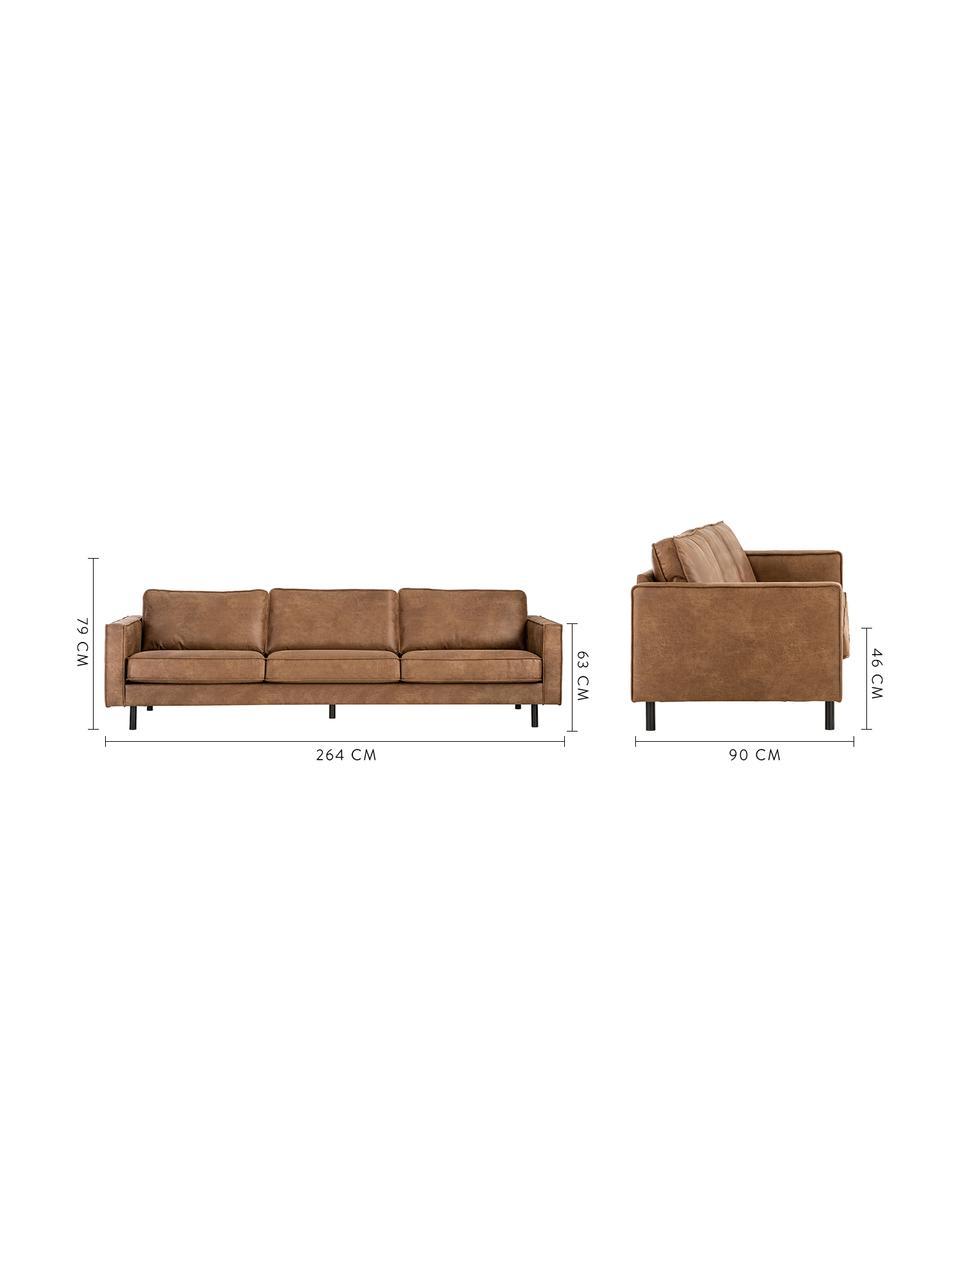 Sofa Hunter 4 Sitzer In Braun Aus Recyceltem Leder Westwingnow